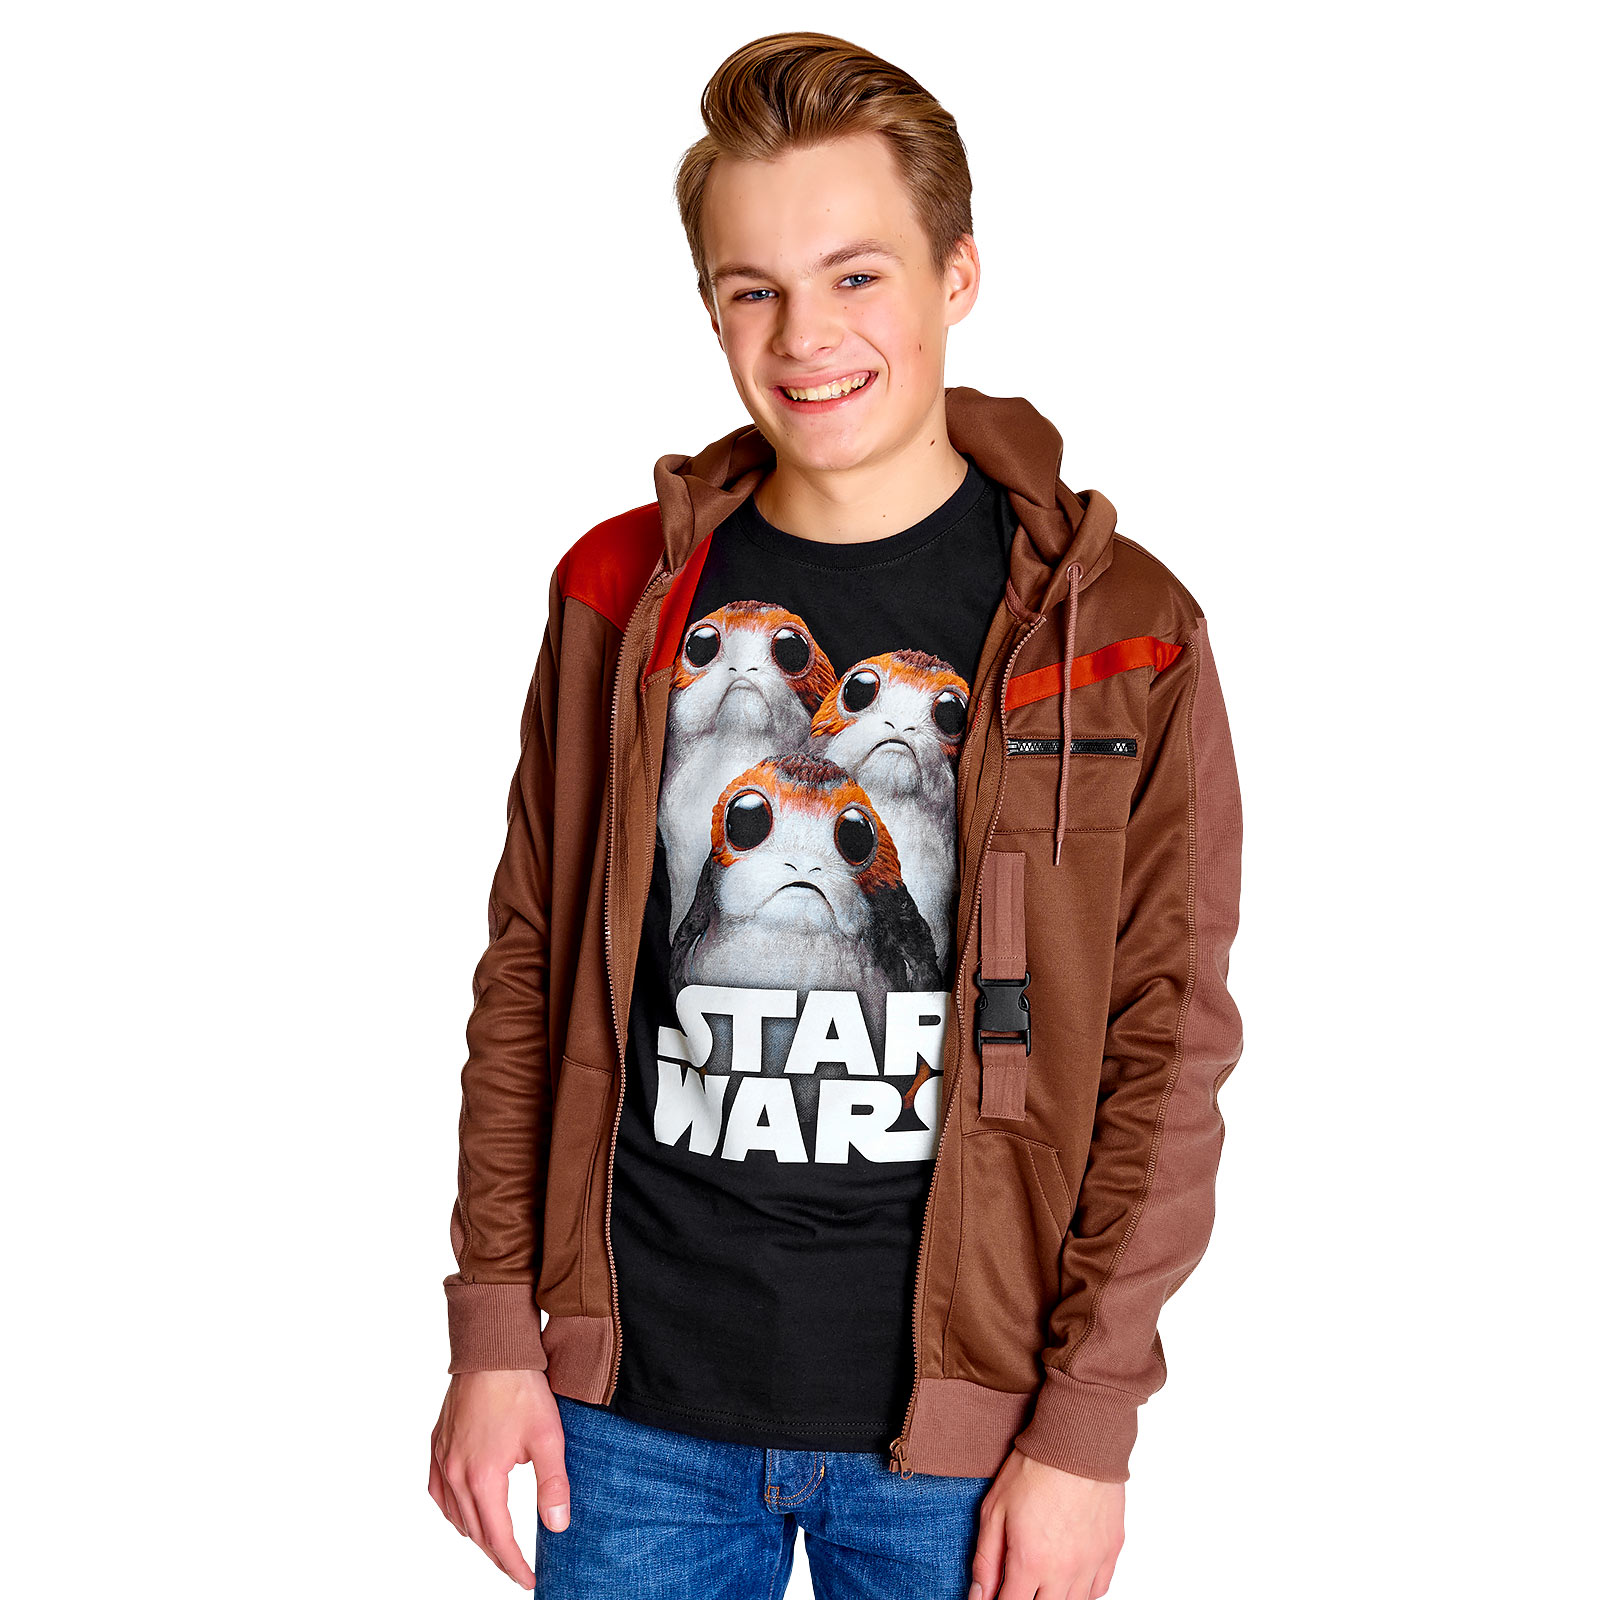 Star Wars - Finn Kapuzenjacke braun